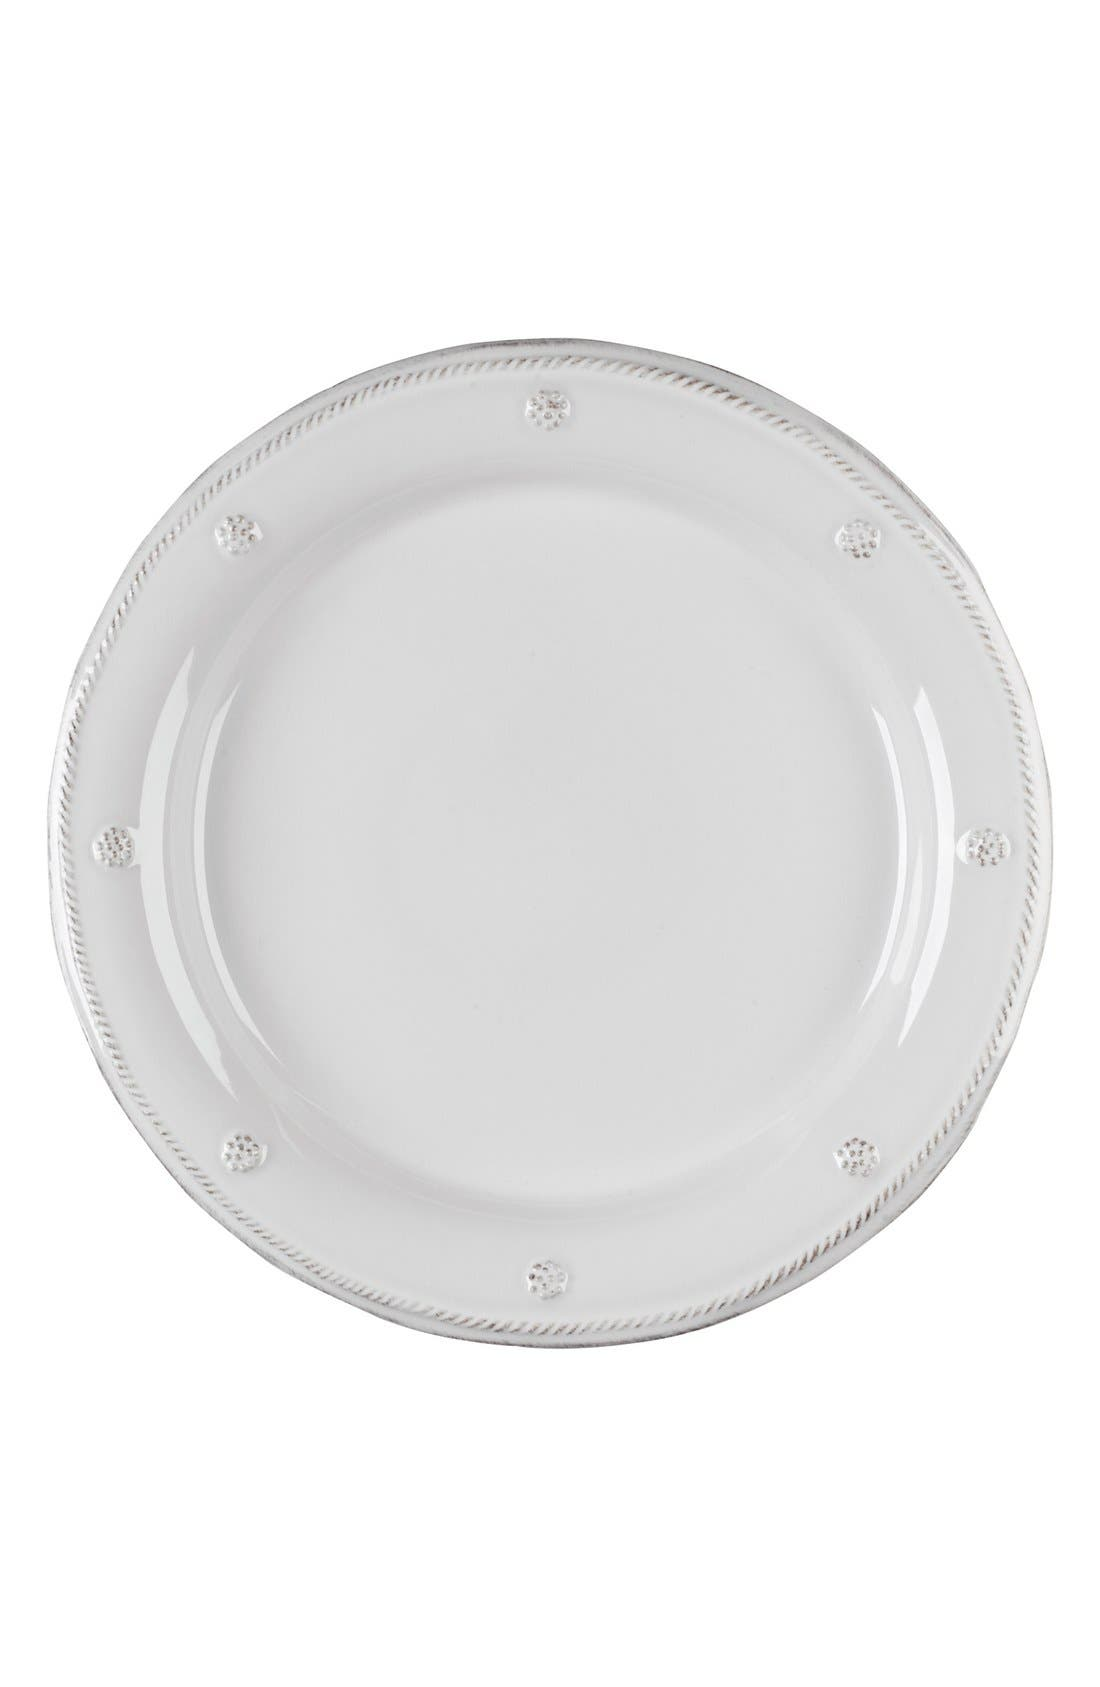 Alternate Image 1 Selected - Juliska 'Berry and Thread' Dinner Plate